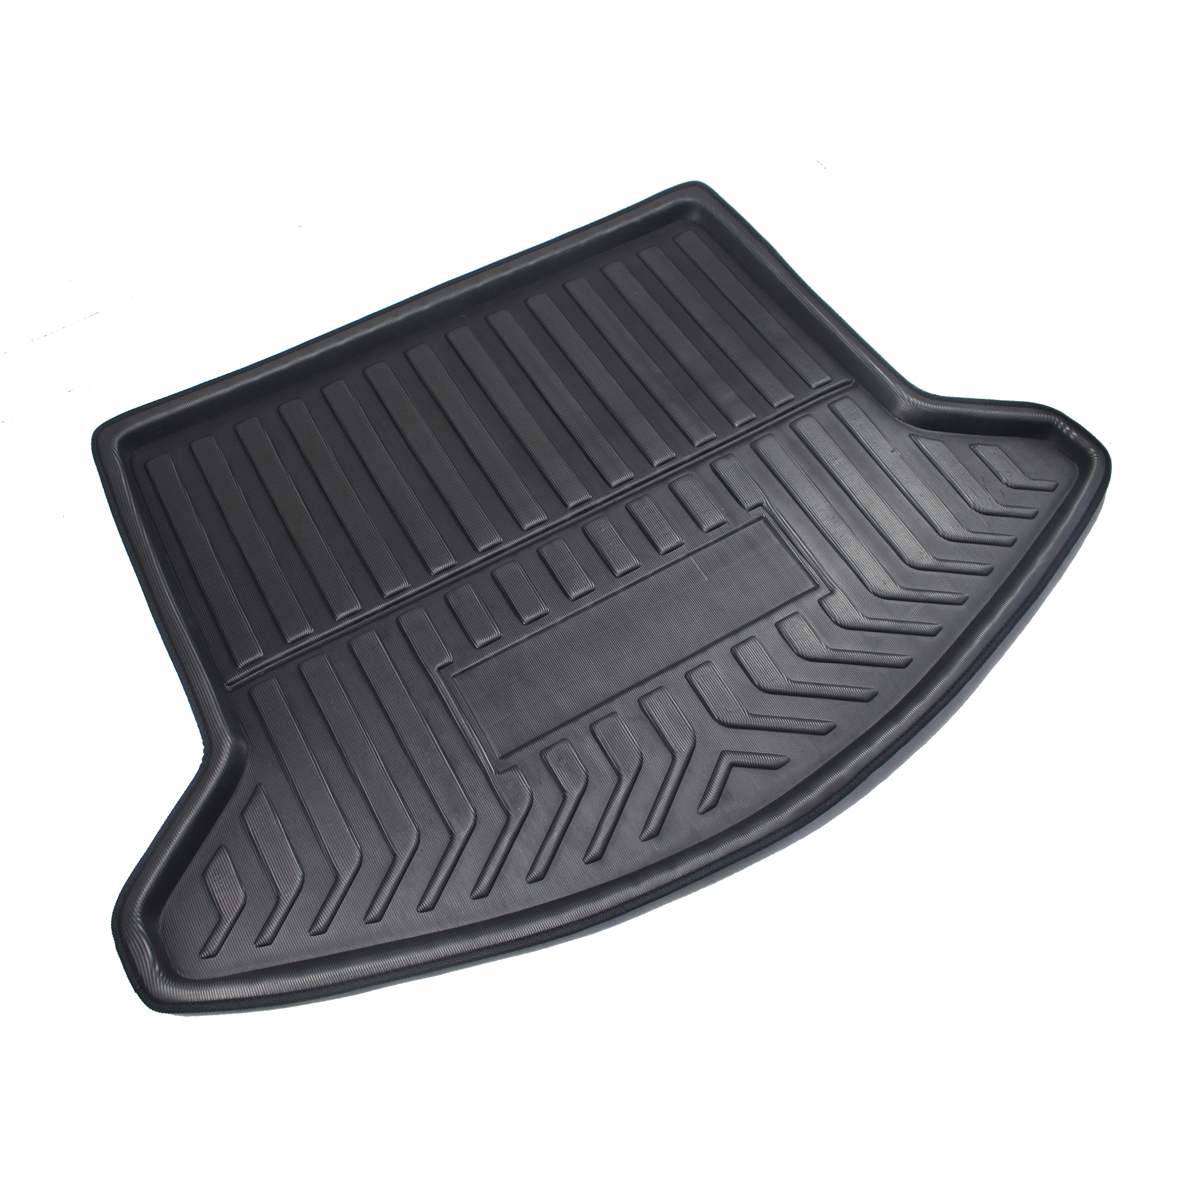 Image 3 - Cargo Liner Boot Tray Rear Trunk Cover Matt Mat Floor Carpet Kick Pad Mud Non slip For Mazda CX 5 CX5 MK2 2017 2018 2019 2nd